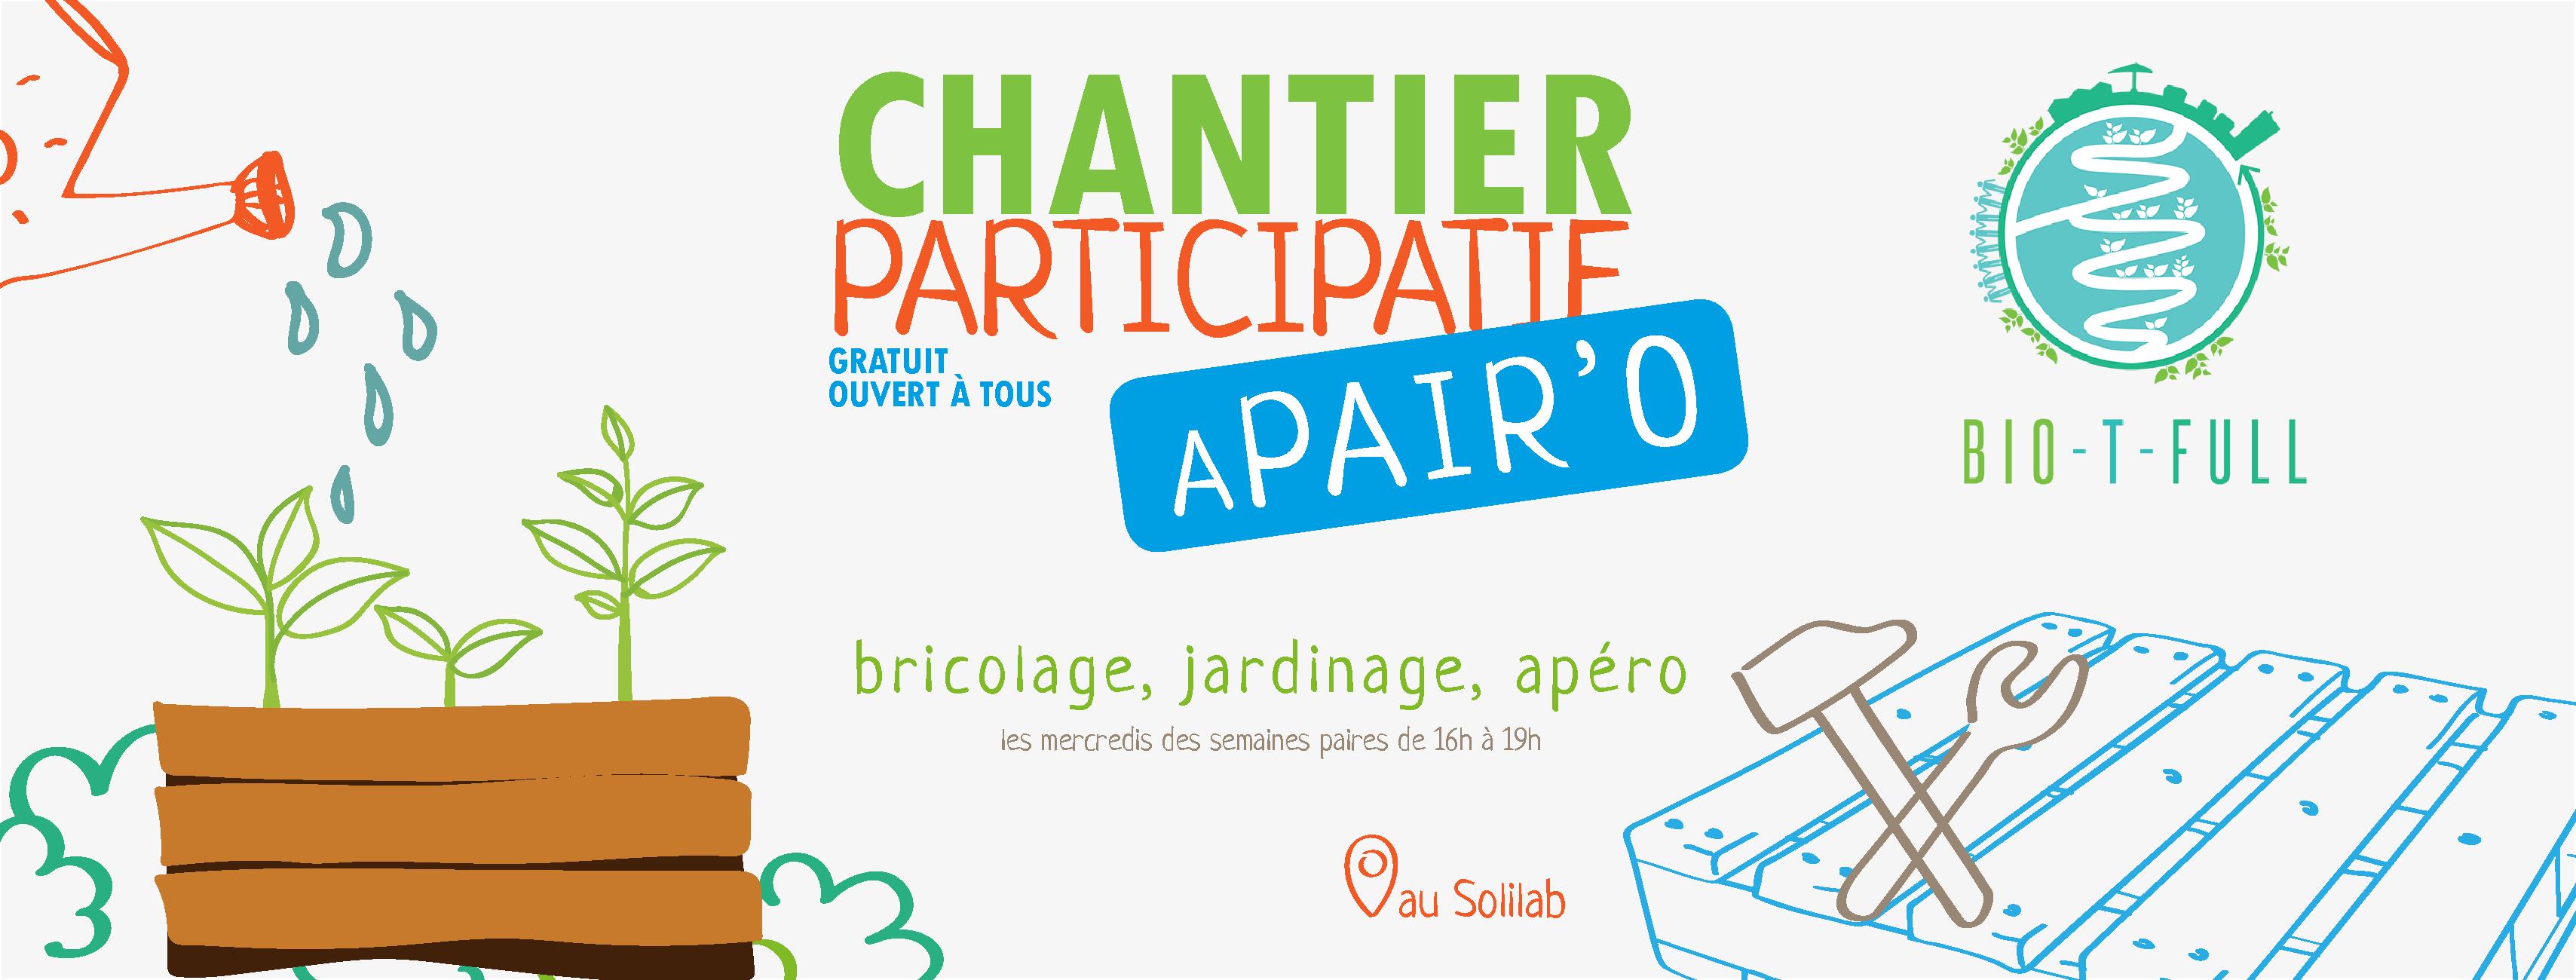 chantier participatif 2